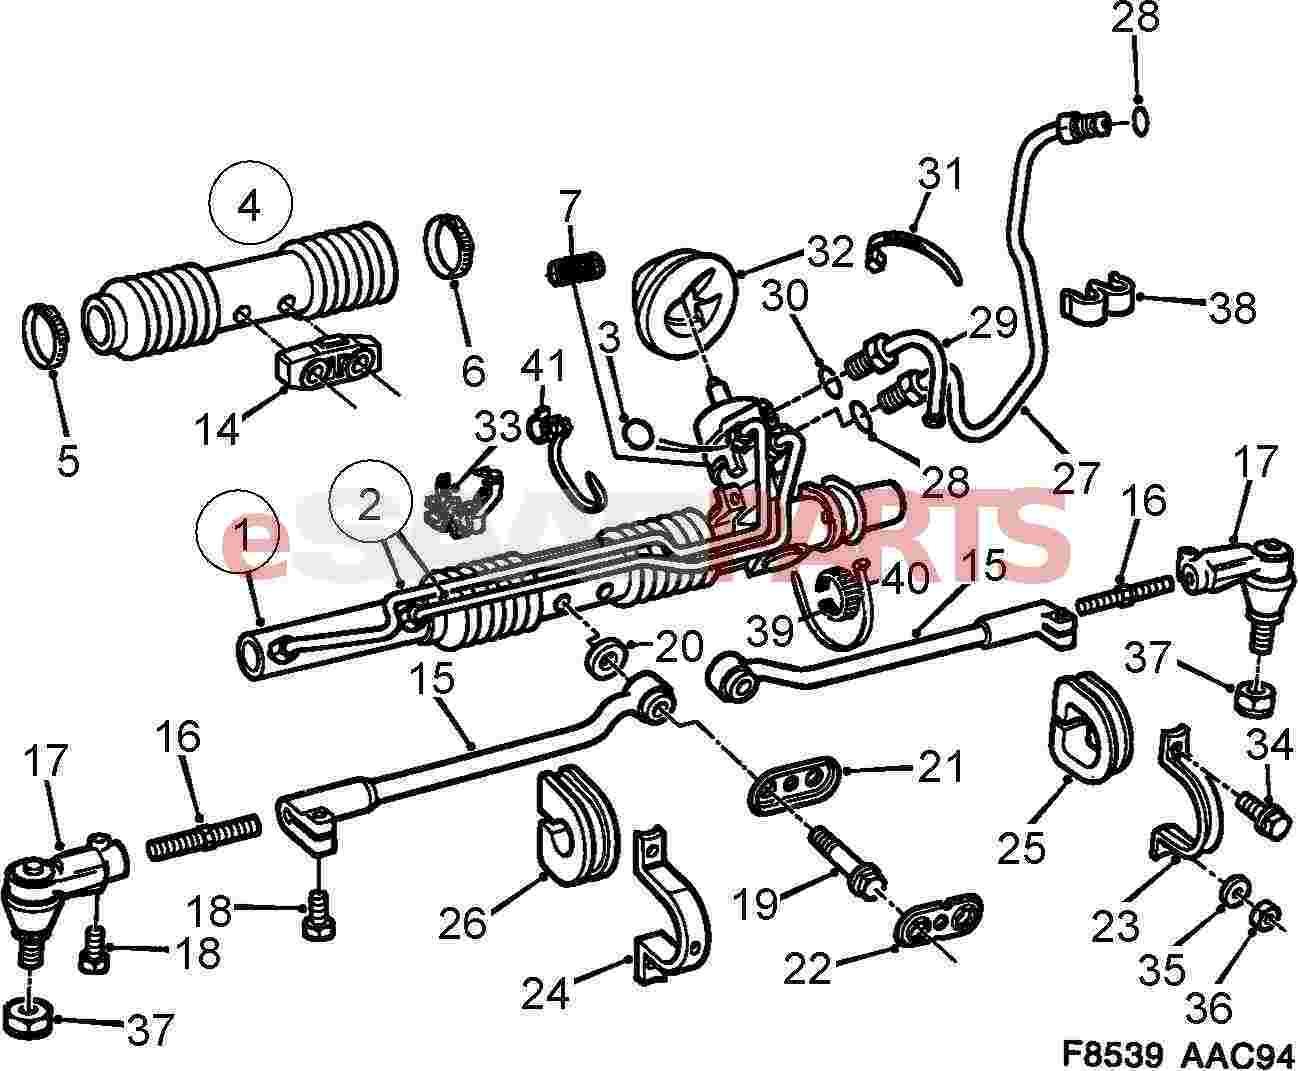 Service Owner Manual 1994 Chevrolet S10 Blazer Wiring